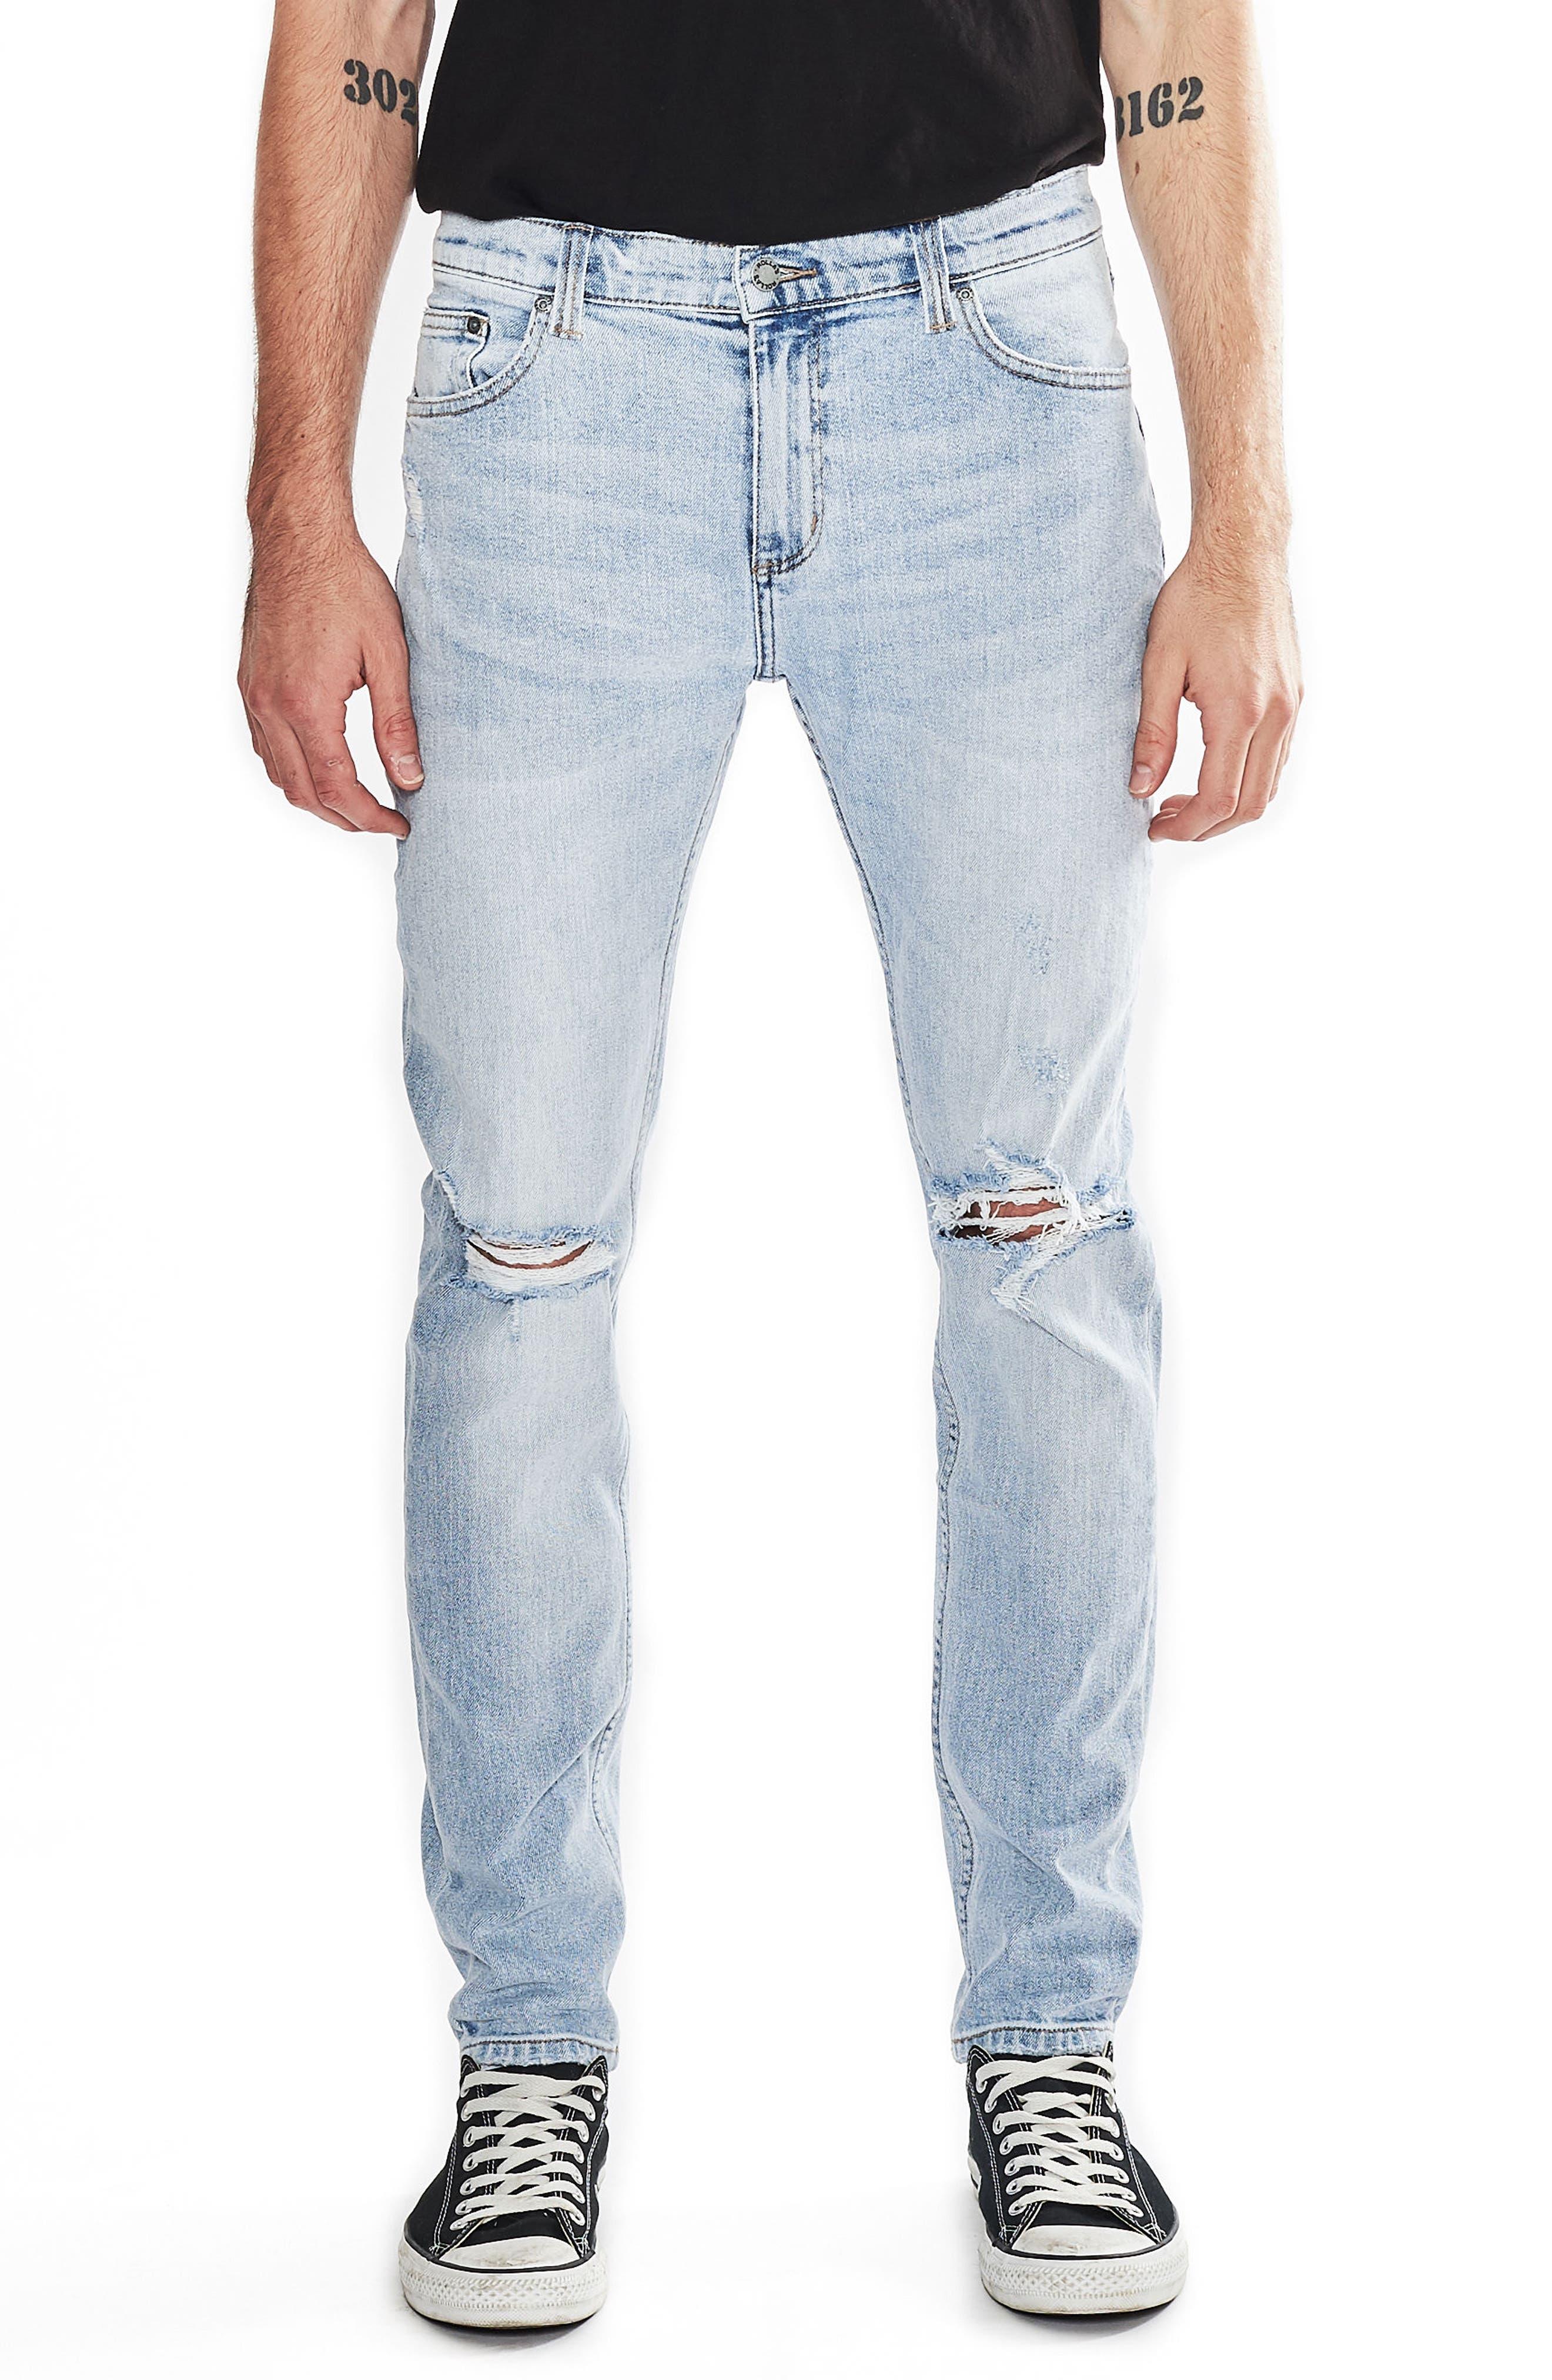 ROLLA'S Stinger Skinny Fit Jeans (Worn Blue)